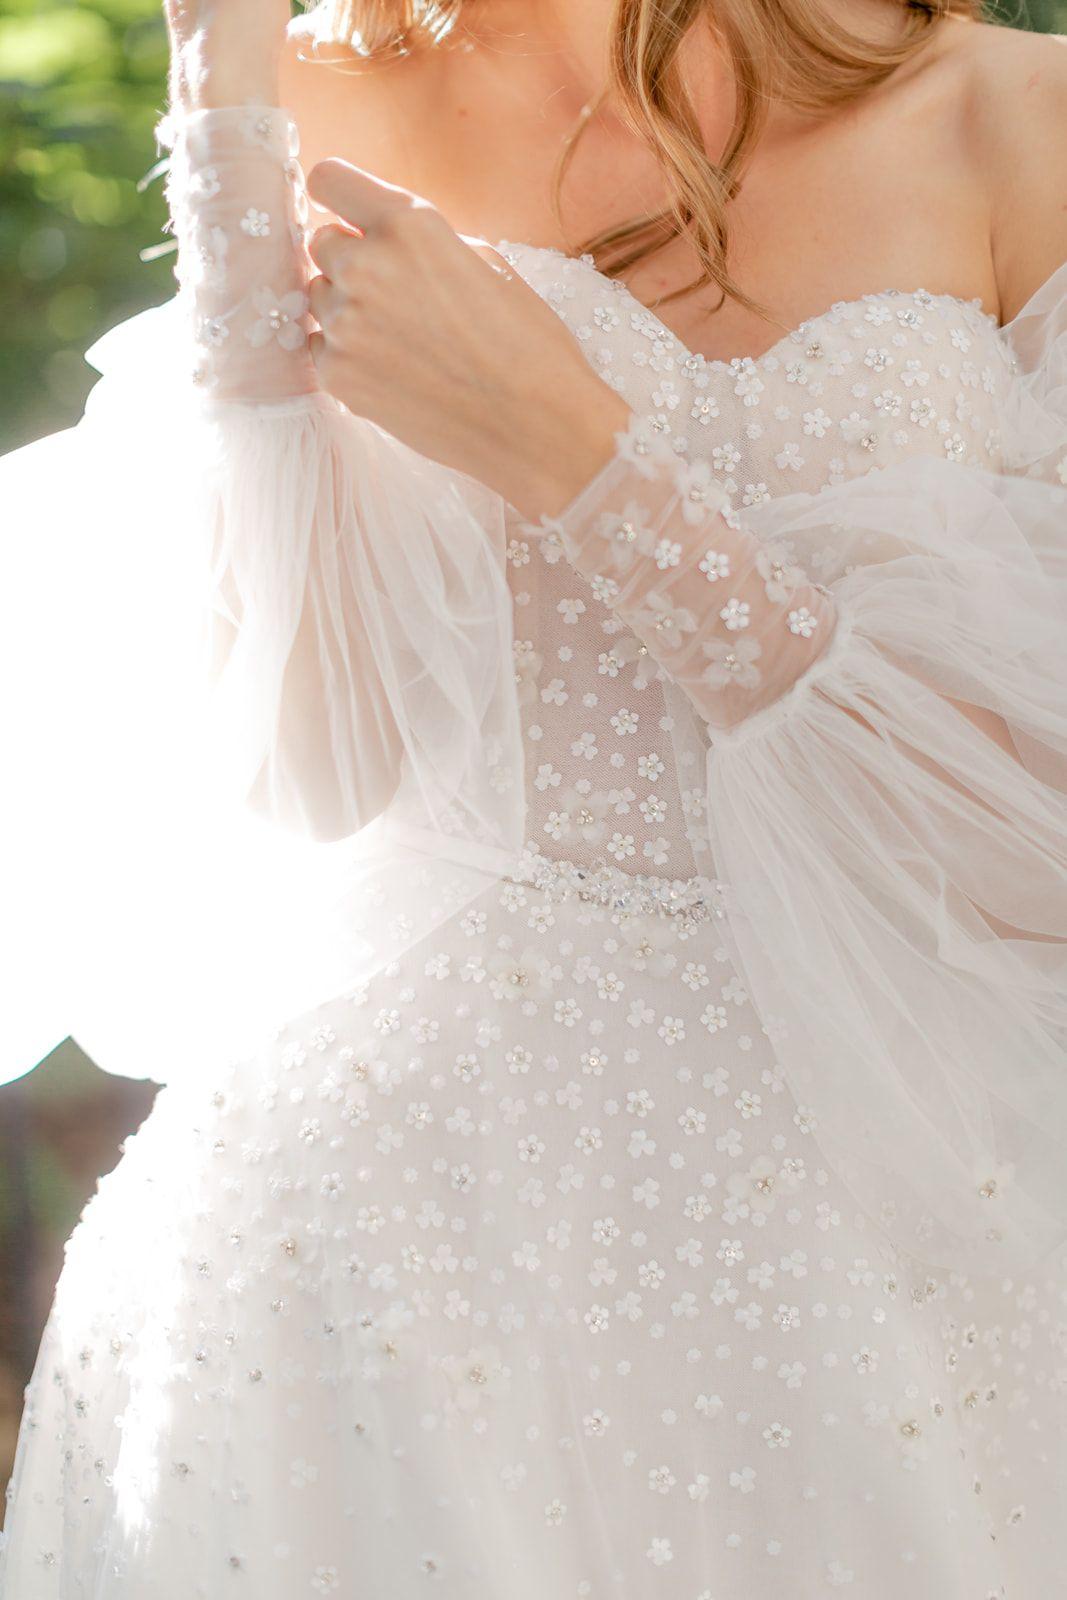 Lee Petra Grebenau Jadore Gown Wedding Dress Necklines Wedding Dresses Wedding Corset